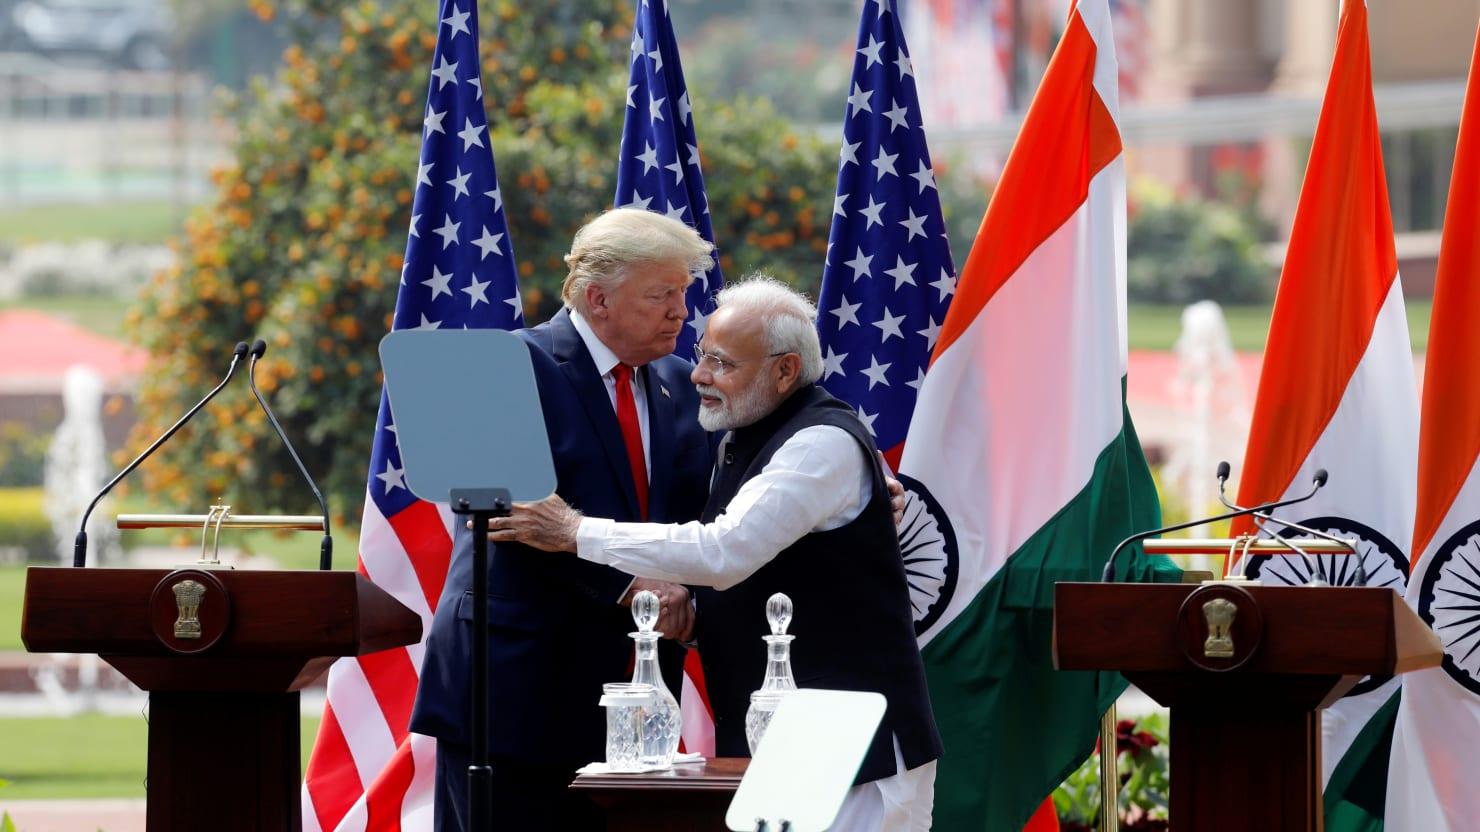 Trump's Delhi Visit Overshadowed After Seven People Killed in Mass Violence